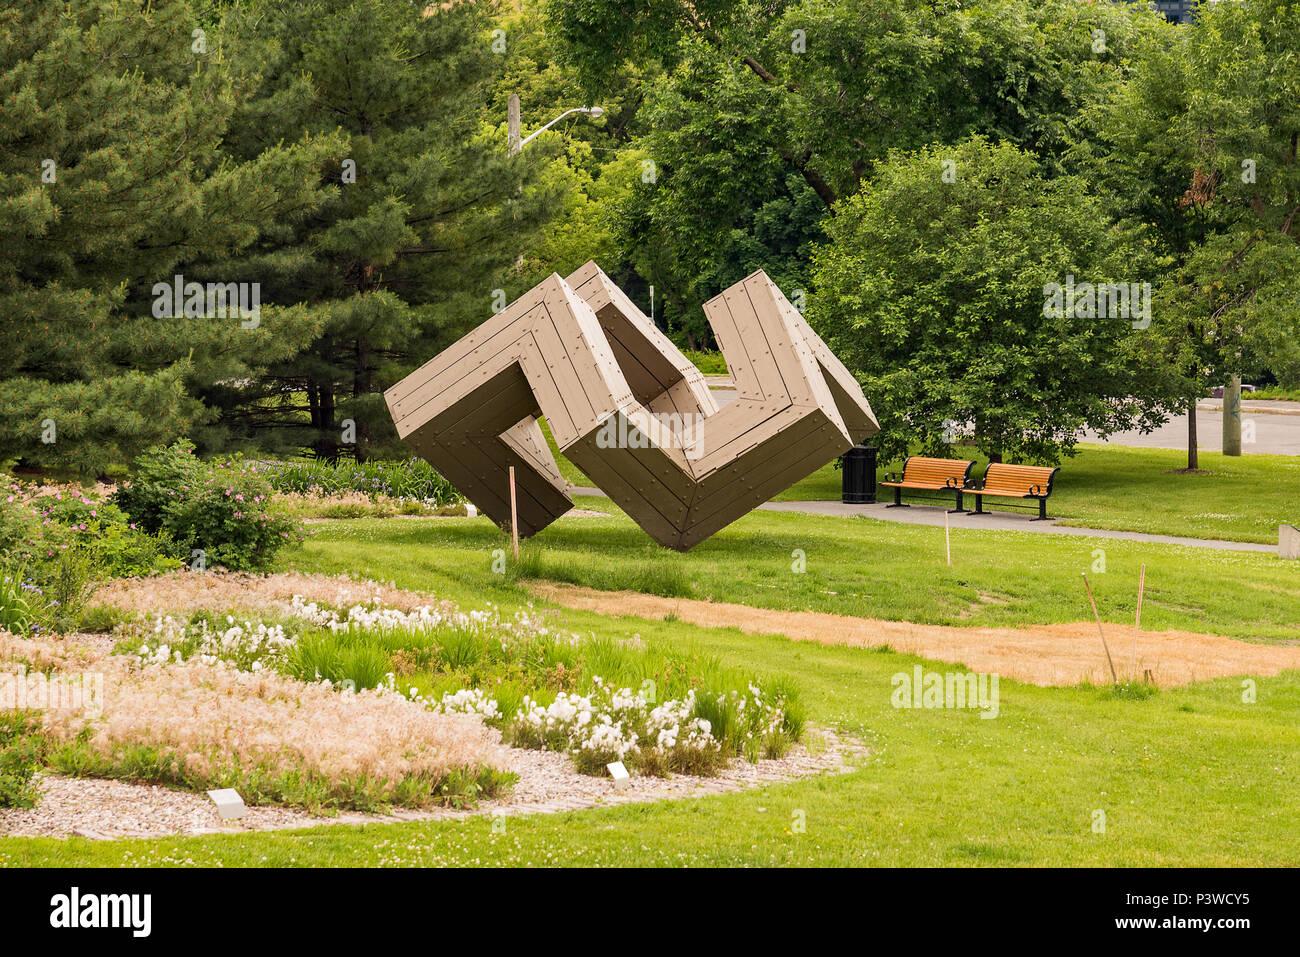 Garden of the Provinces, Ottawa, Canada. - Stock Image